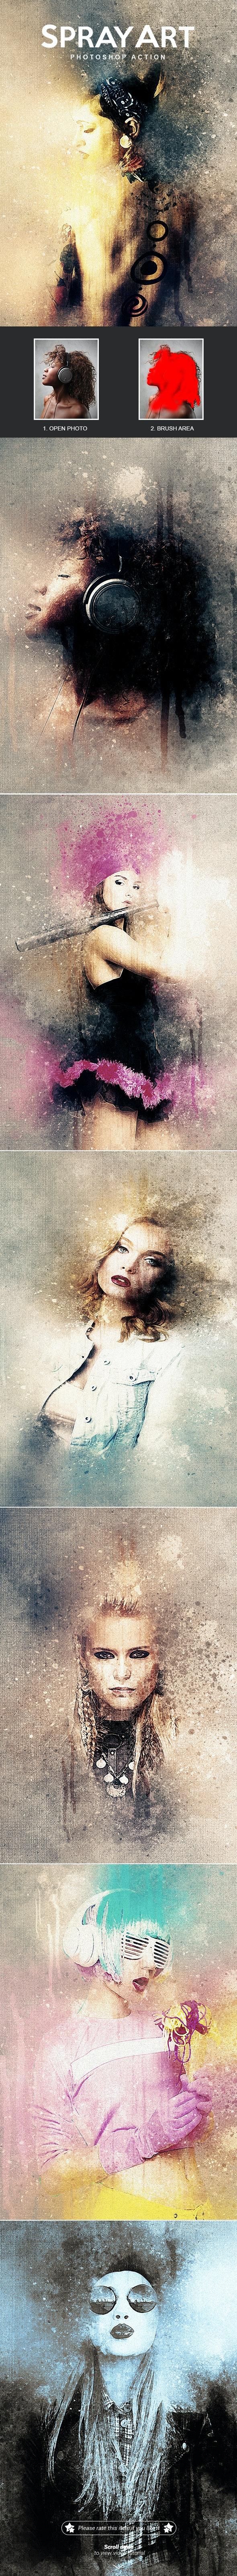 SprayArt - Photoshop Action - Photo Effects Actions